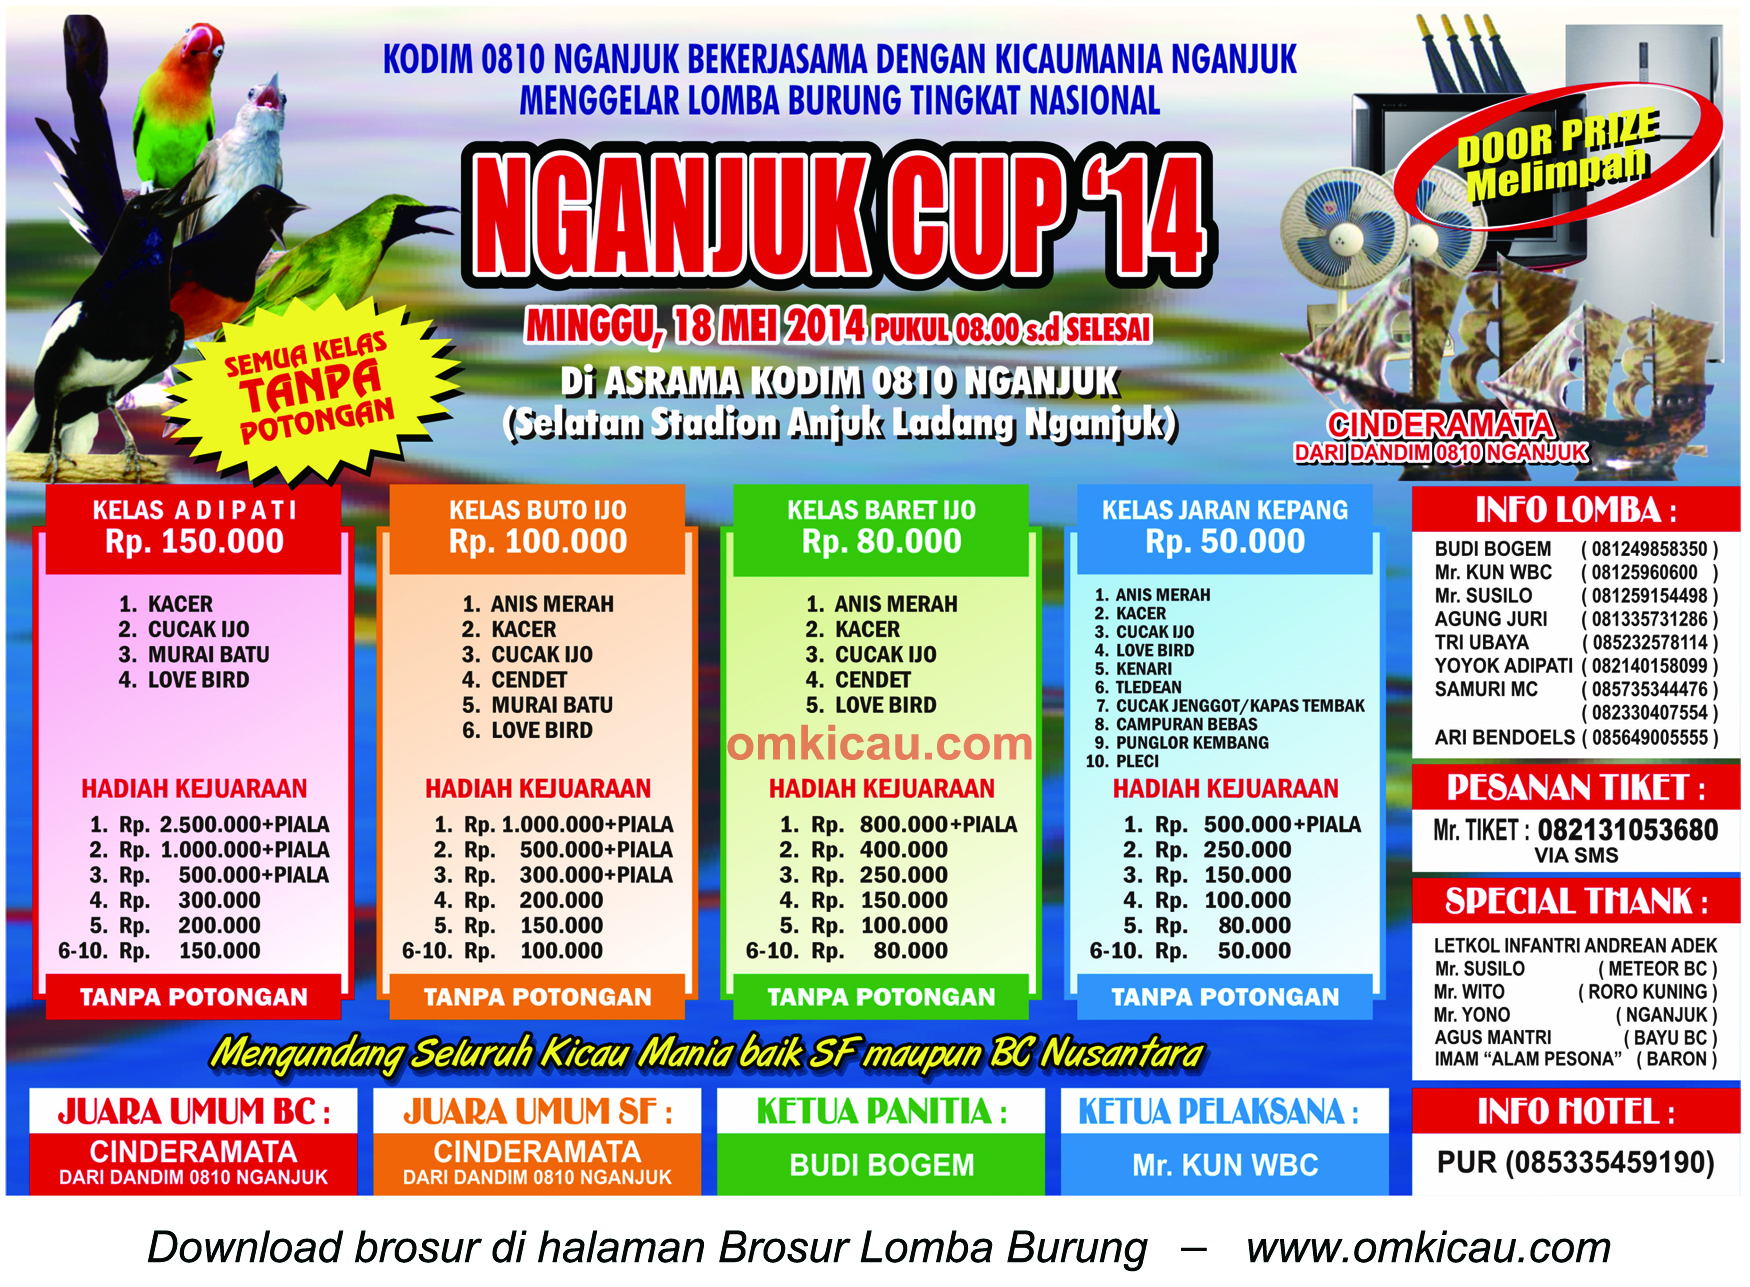 Brosur Lomba Burung Berkicau Nganjuk Cup, Nganjuk, 18 Mei 2014